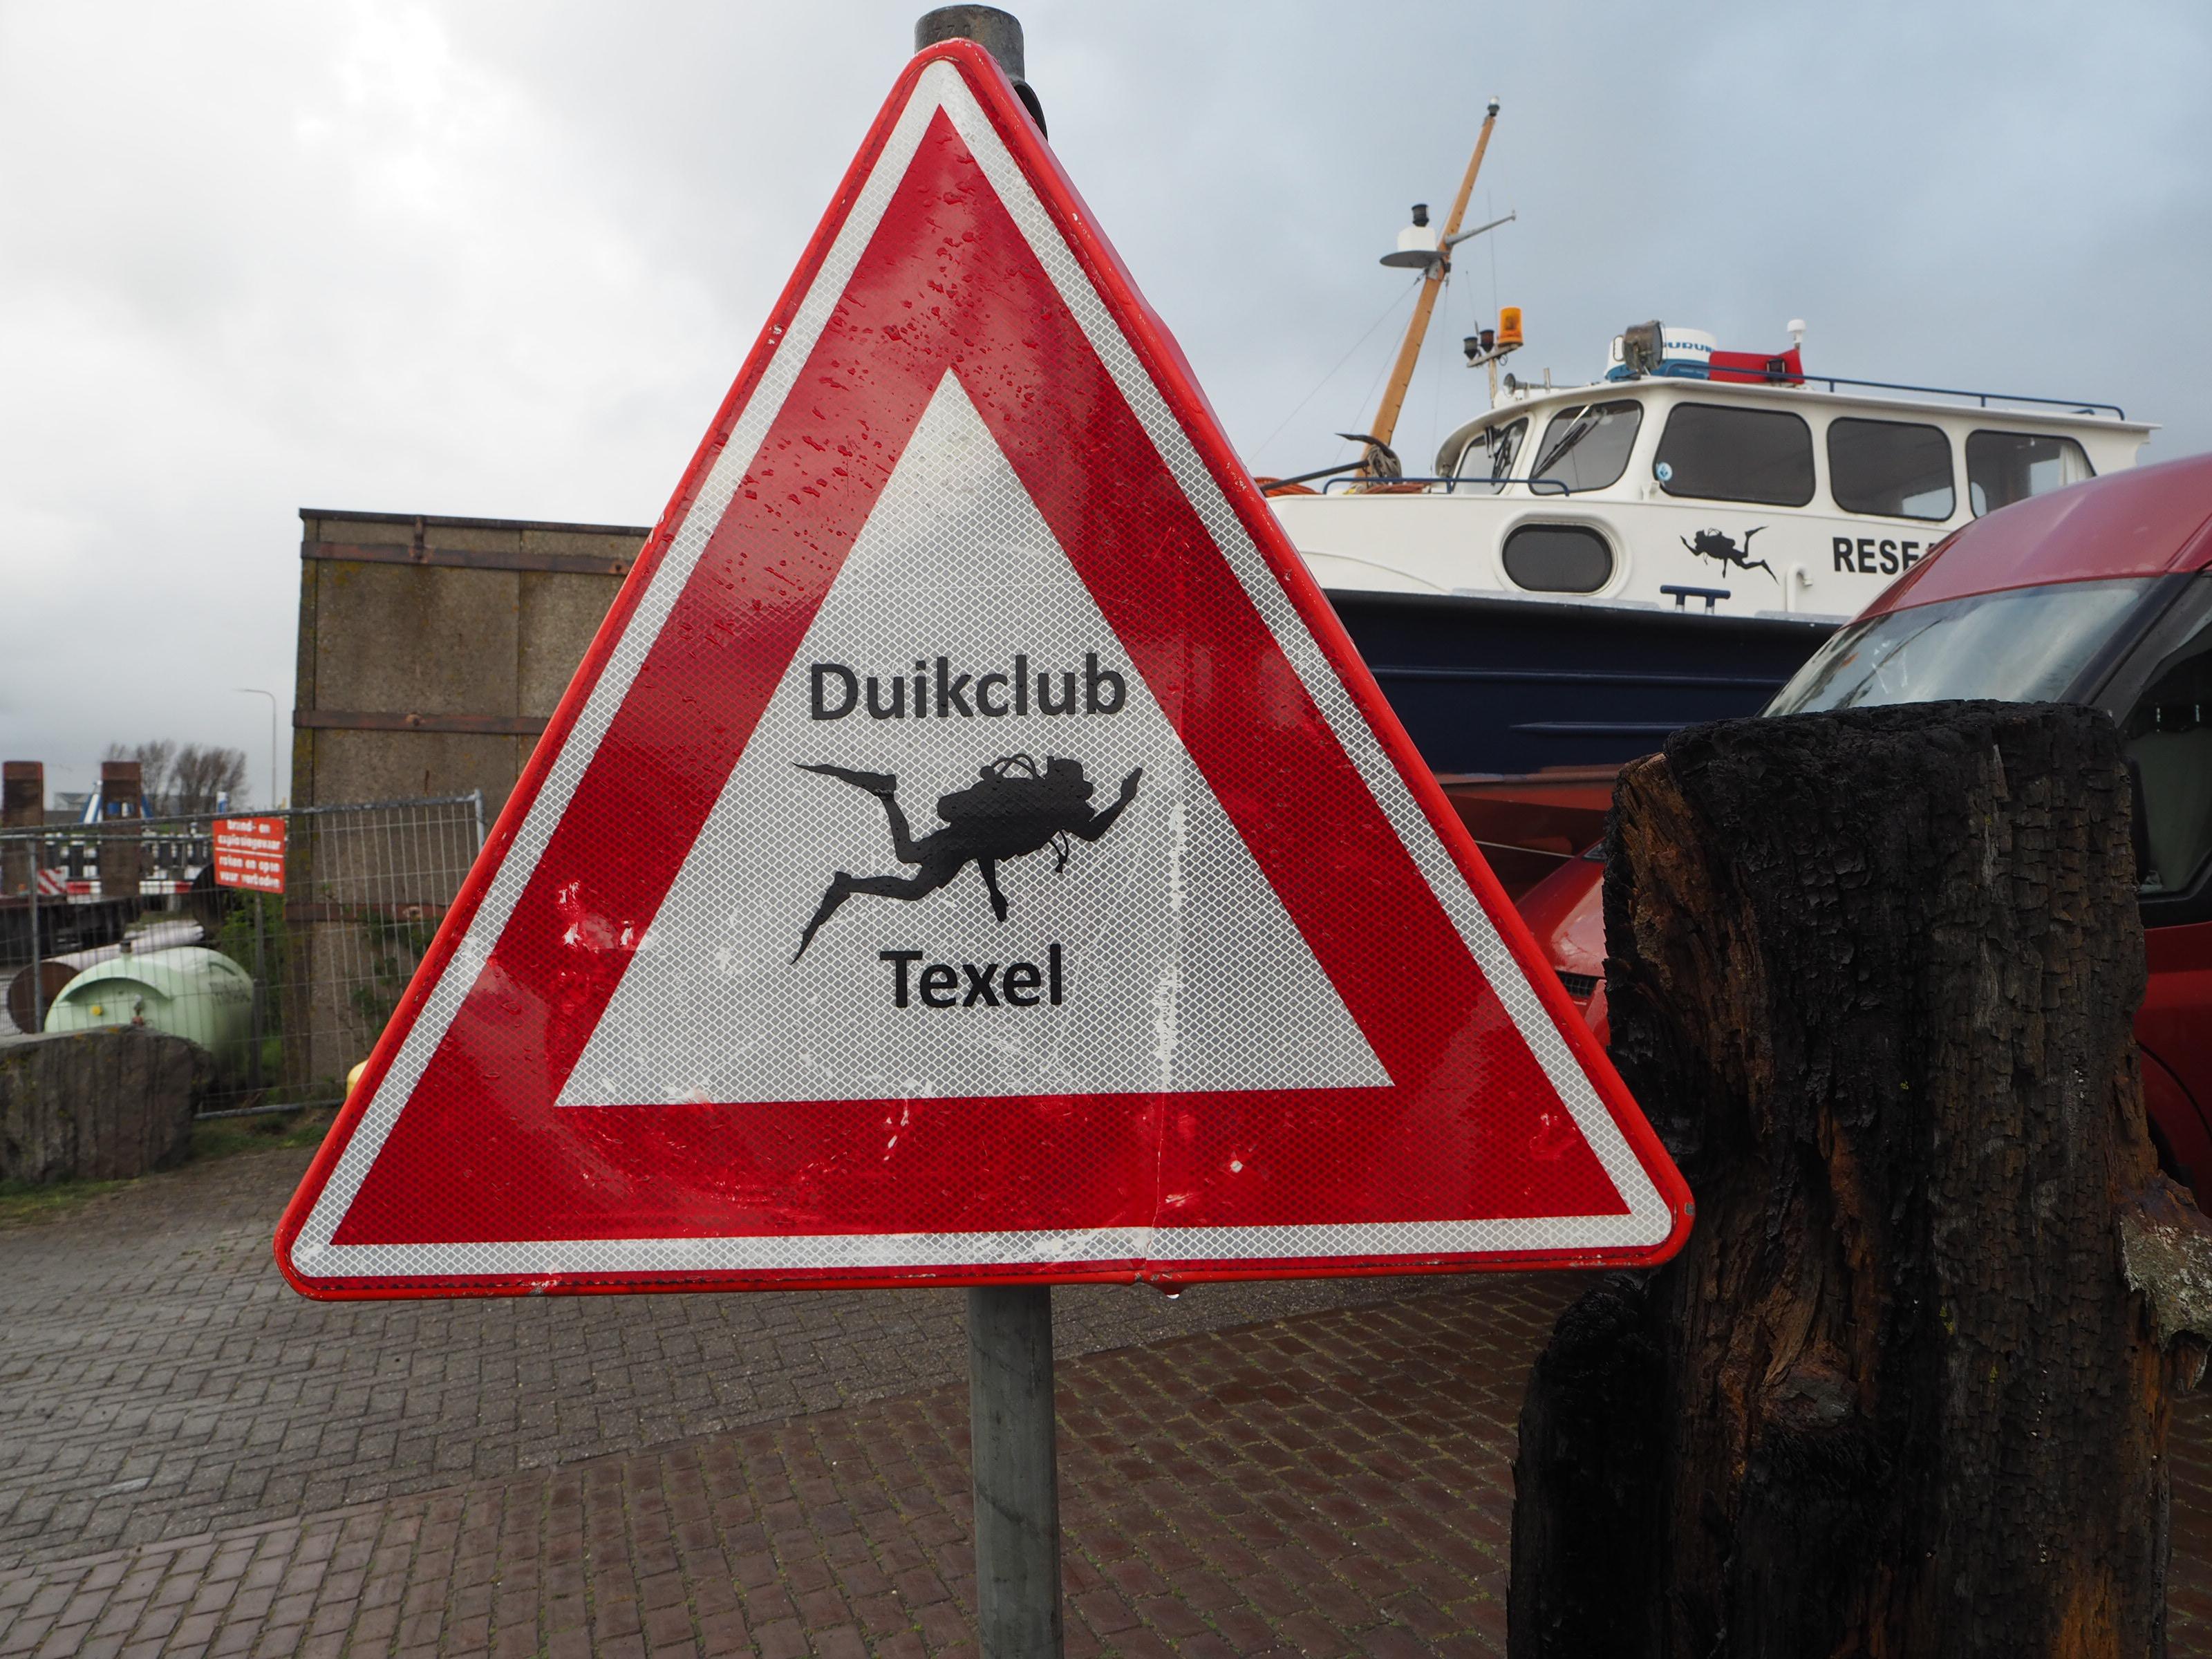 duikclub_Texel_Marloes_Otten